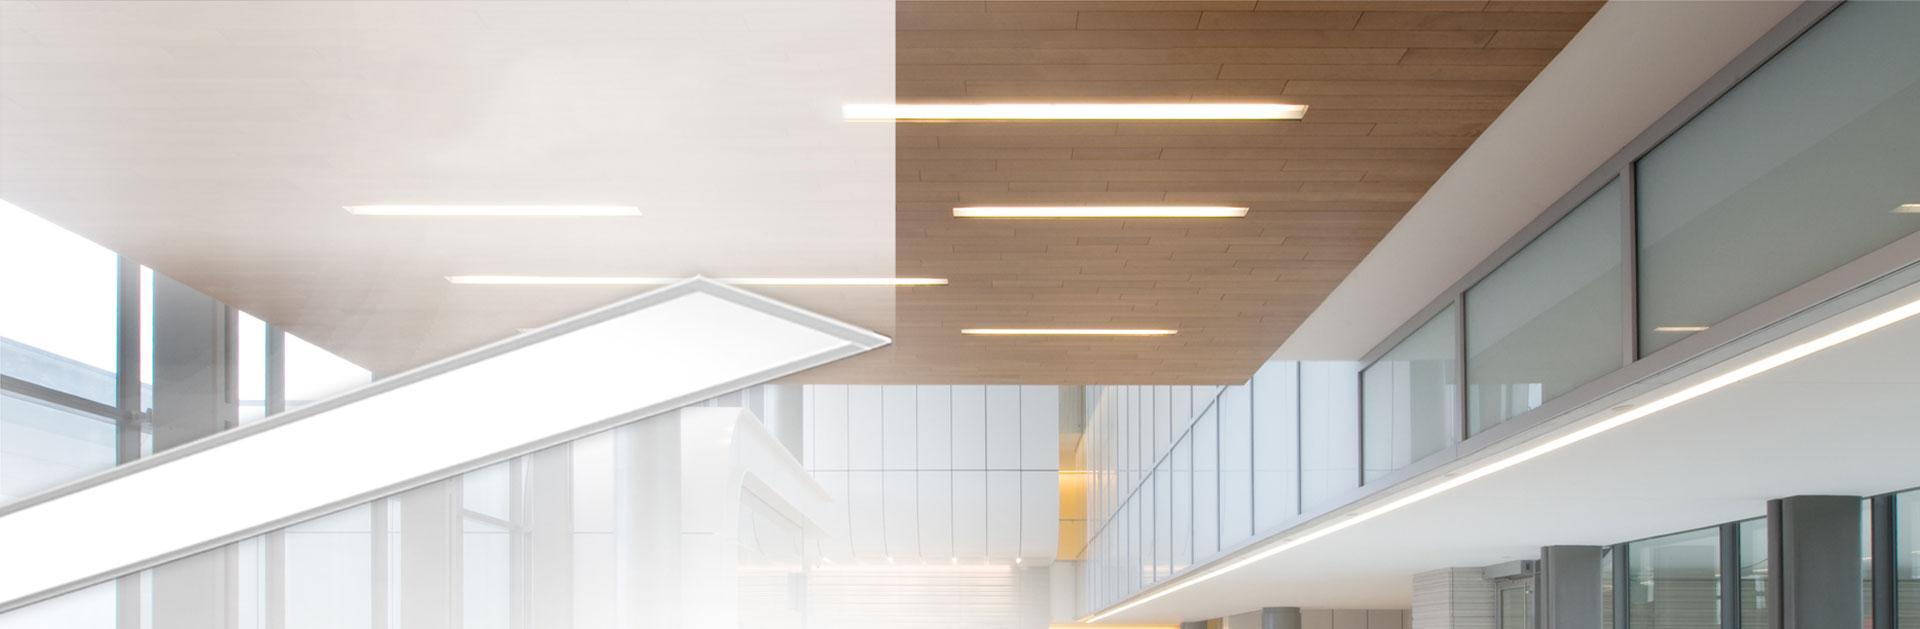 lighting - اهمیت نورپردازی